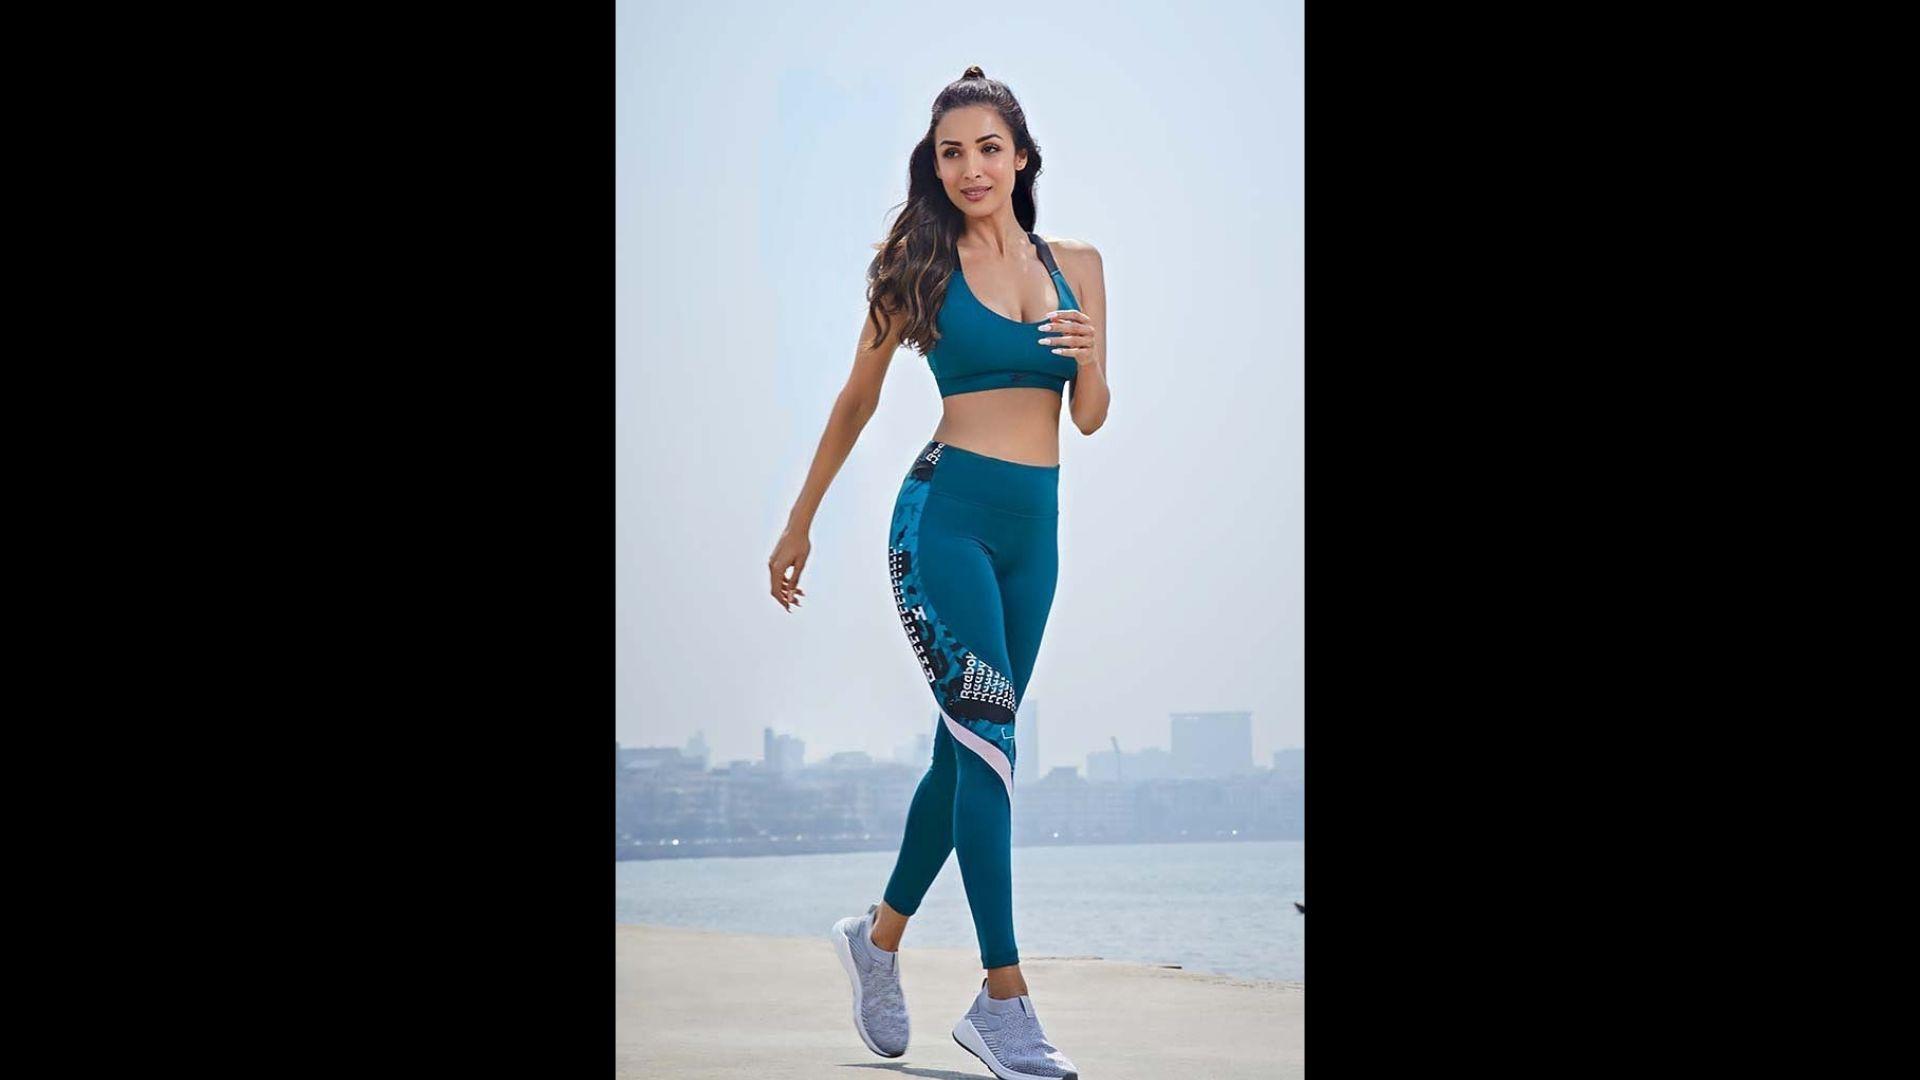 Malaika Arora Flaunts Her Perfect Curvy Figure In Fashionable Blue Tie-Dye Athleisure